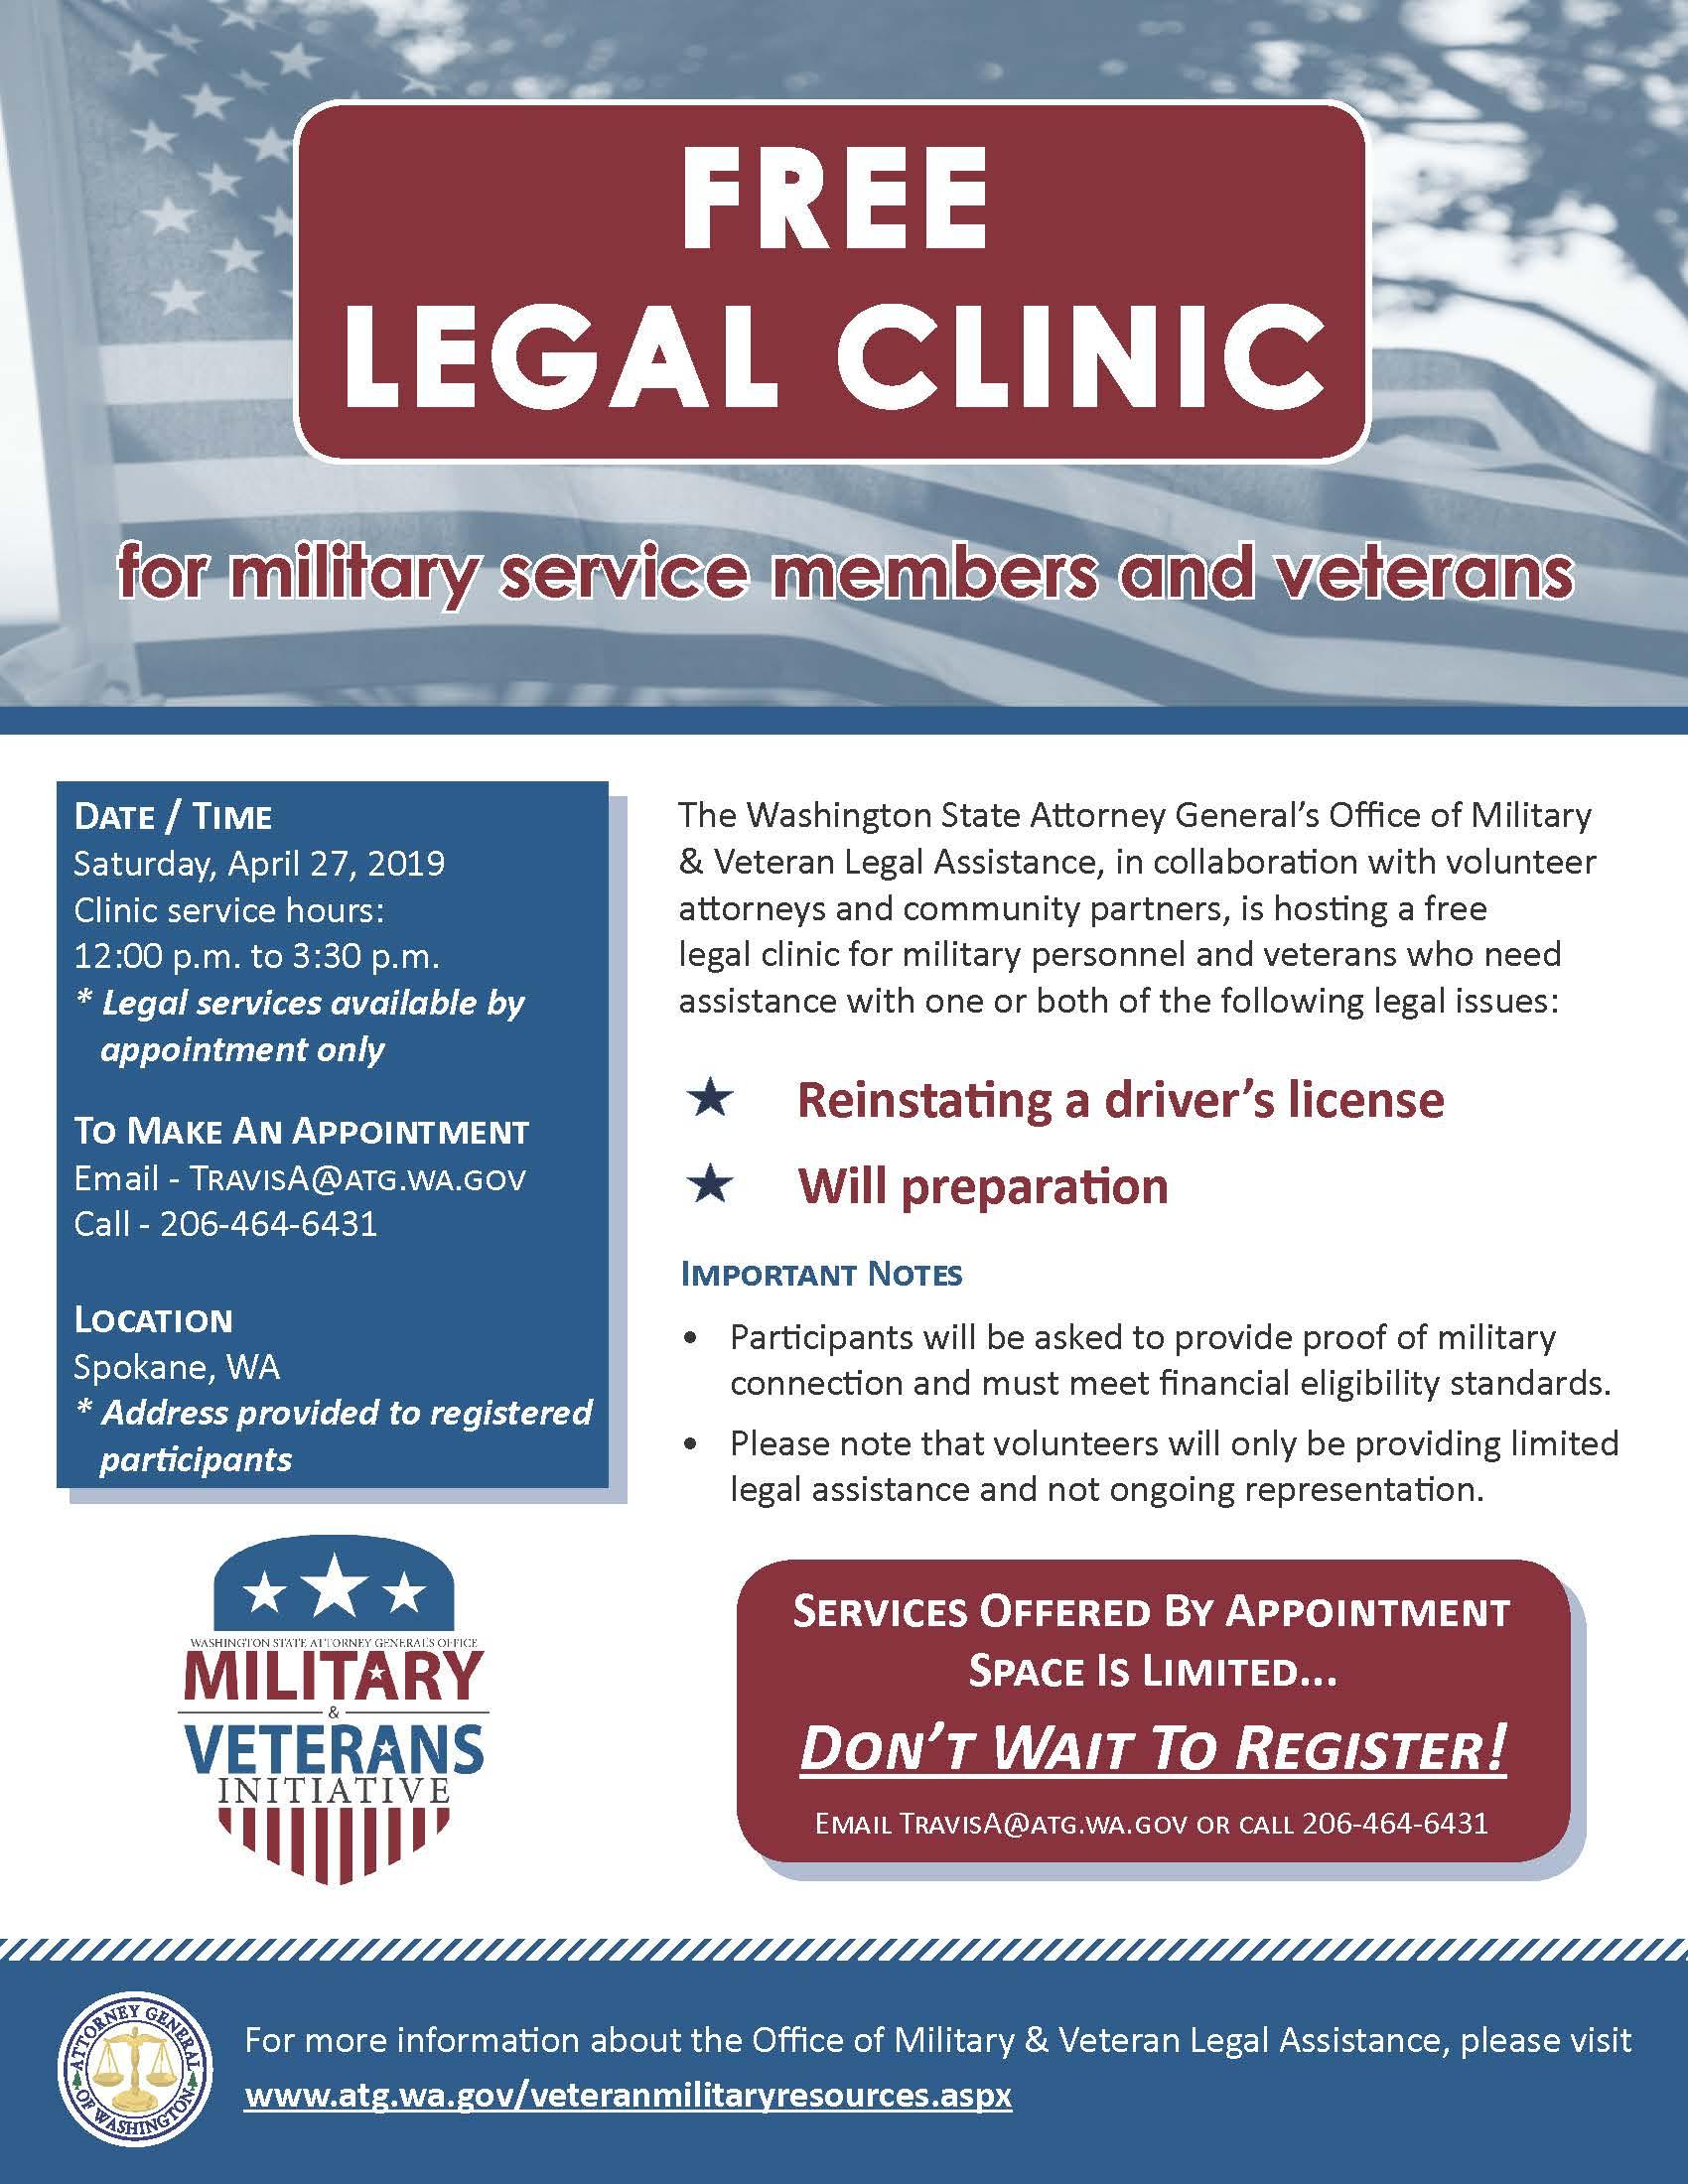 Military Veteran Legal Clinic Flyer_Spokane_April 27.jpg